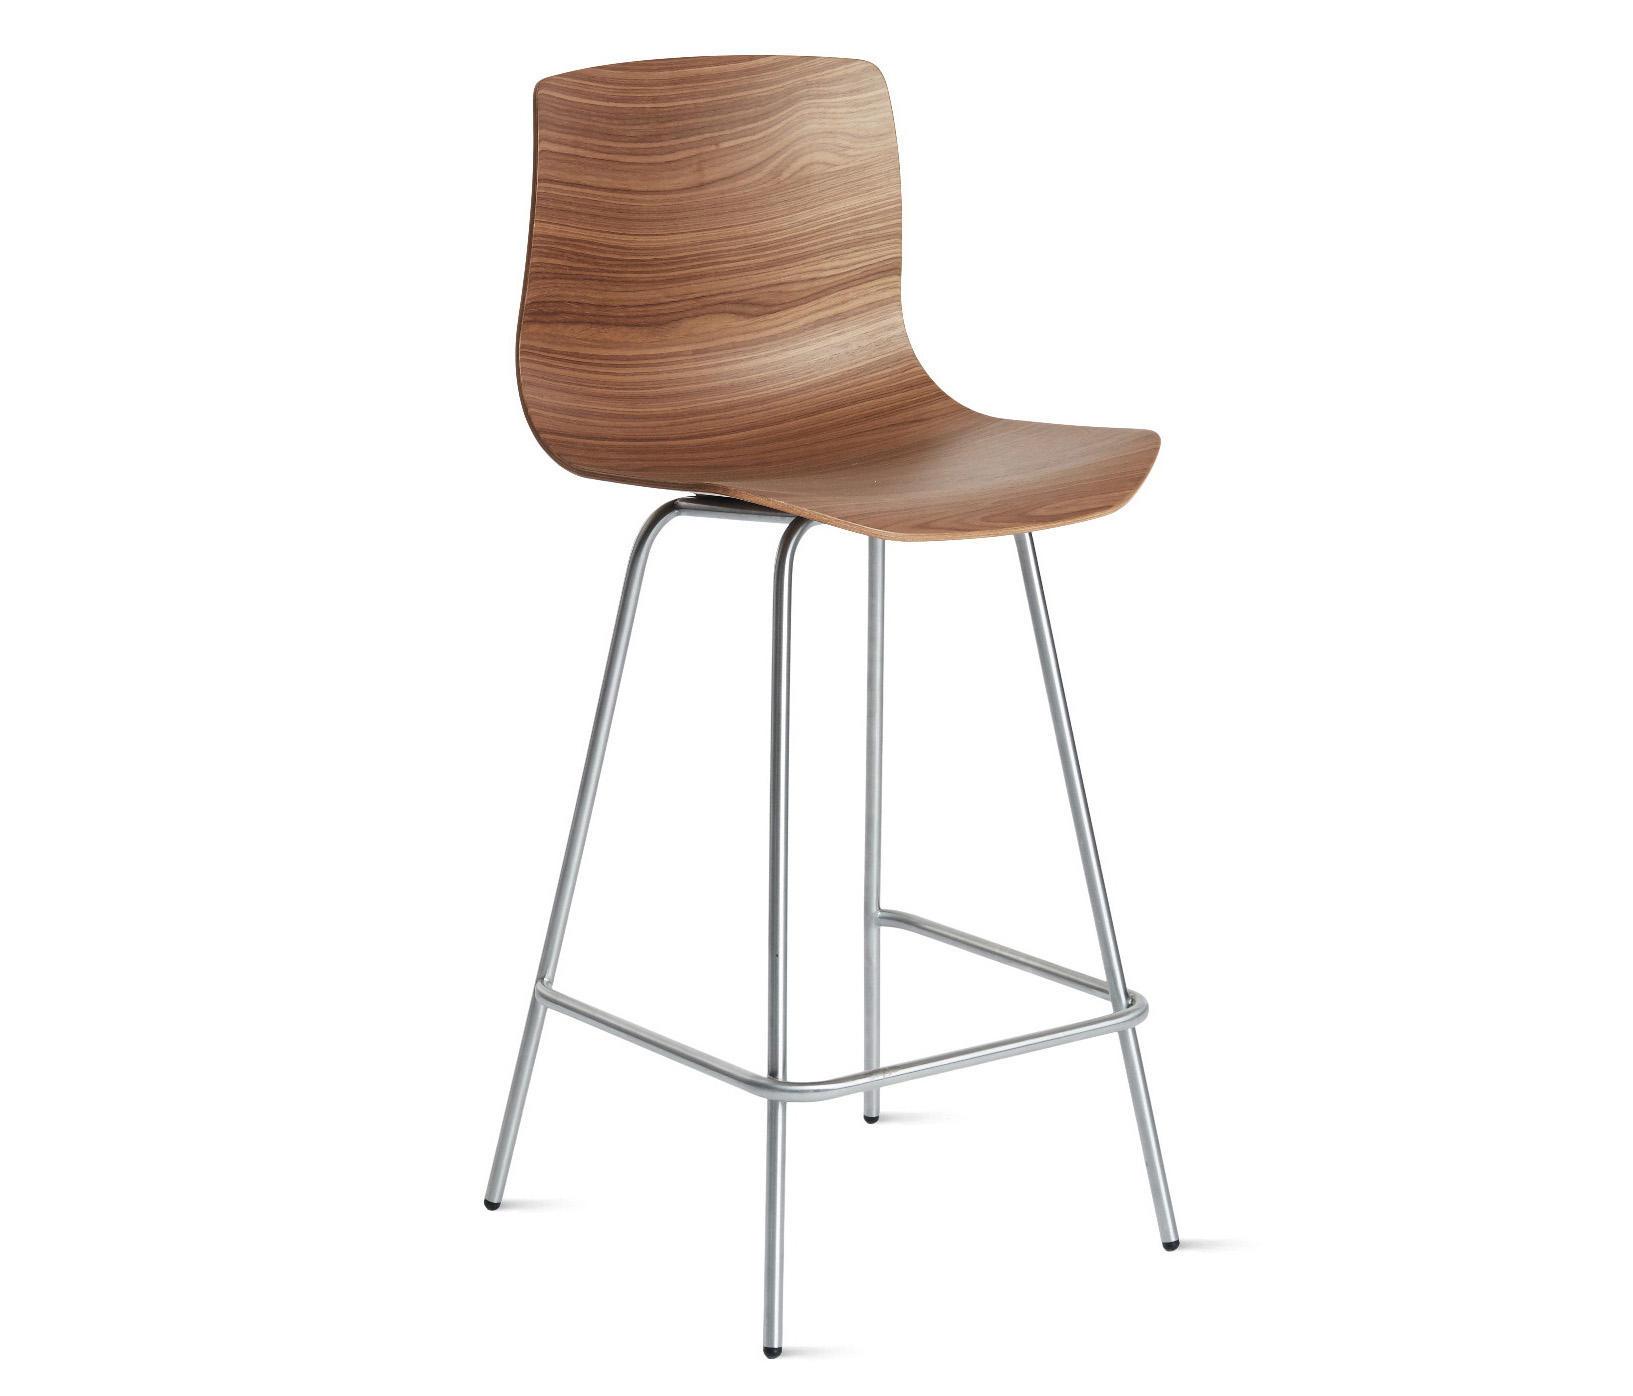 Astonishing Loku Counter Stool Designer Furniture Architonic Machost Co Dining Chair Design Ideas Machostcouk